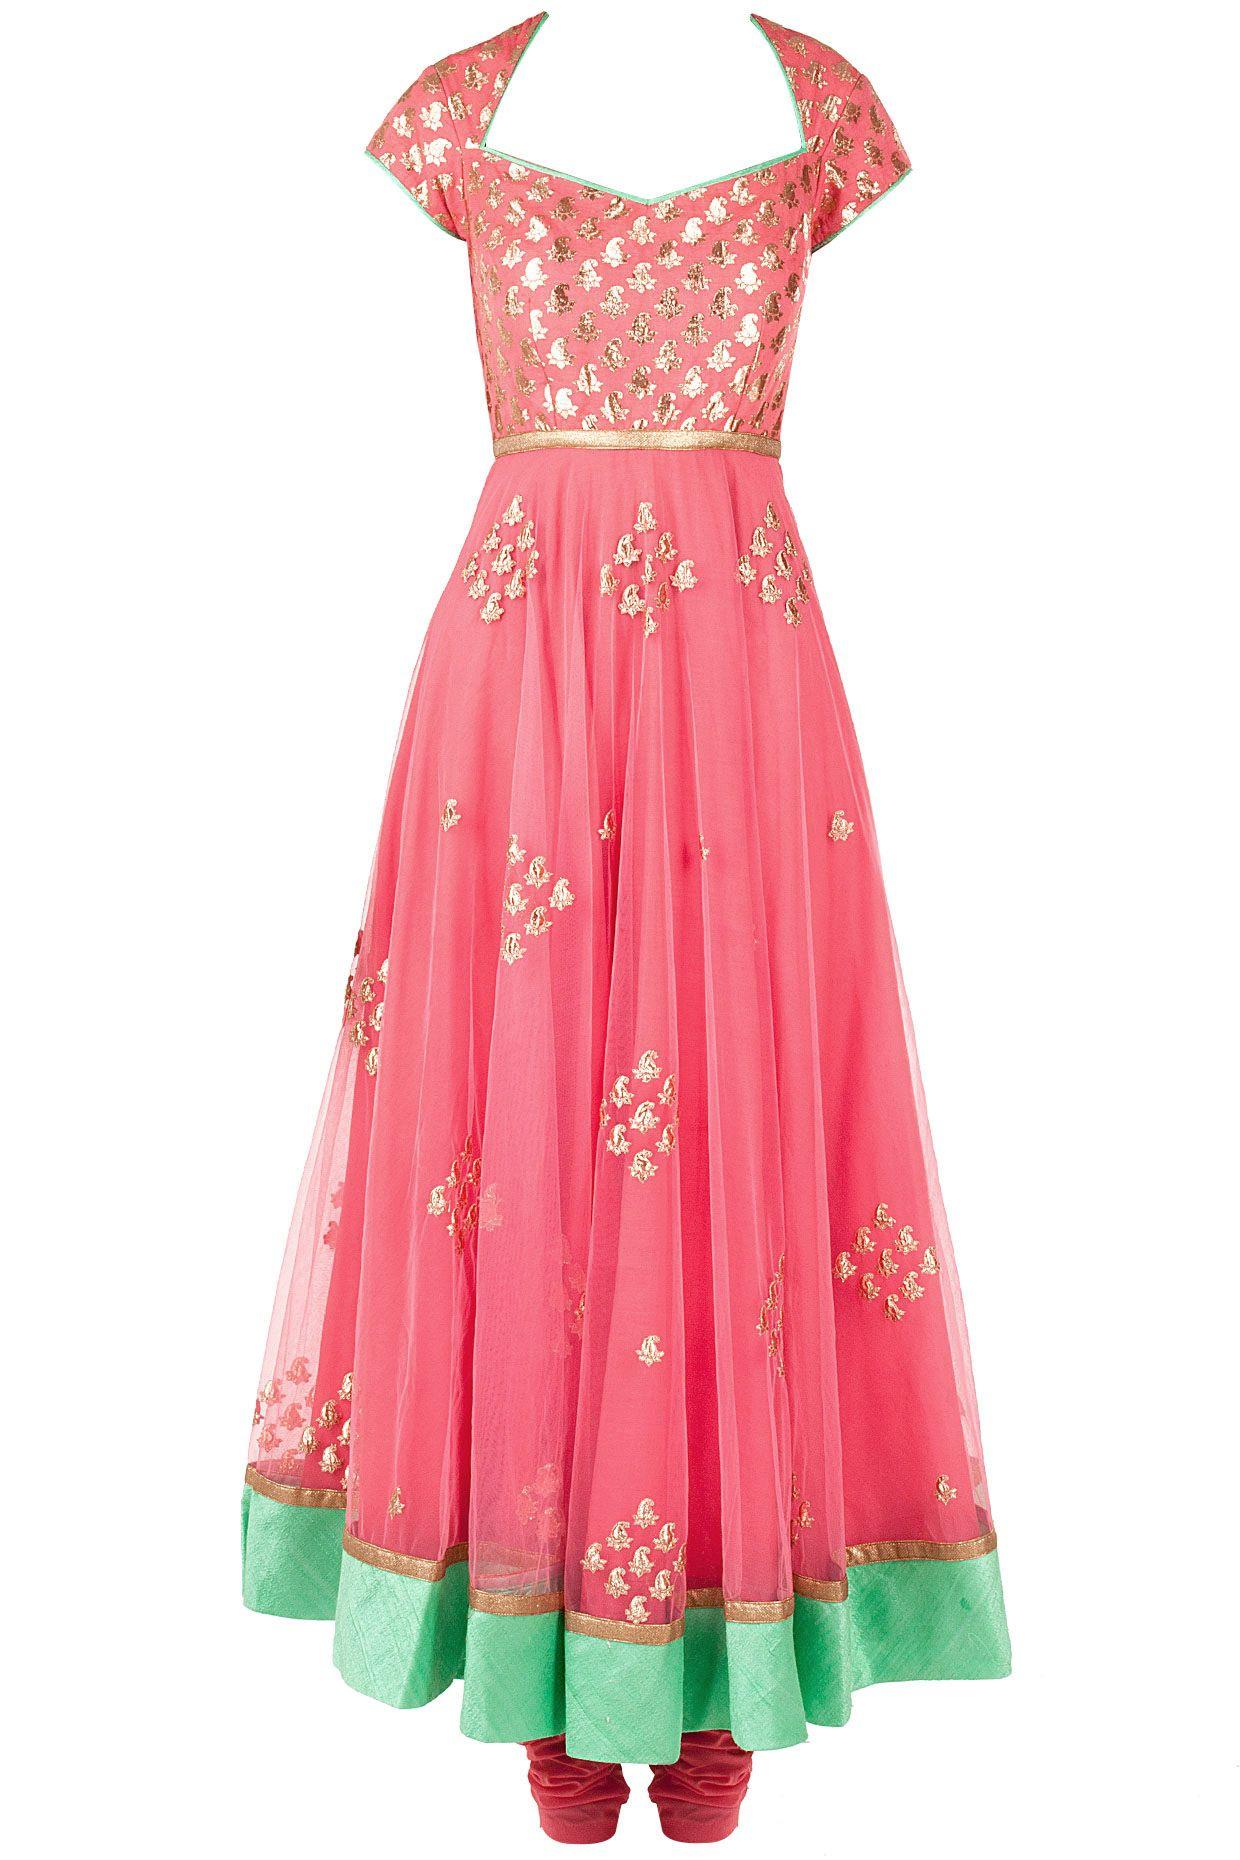 Pink and green chanderi brocade anarkali kurta set available only at